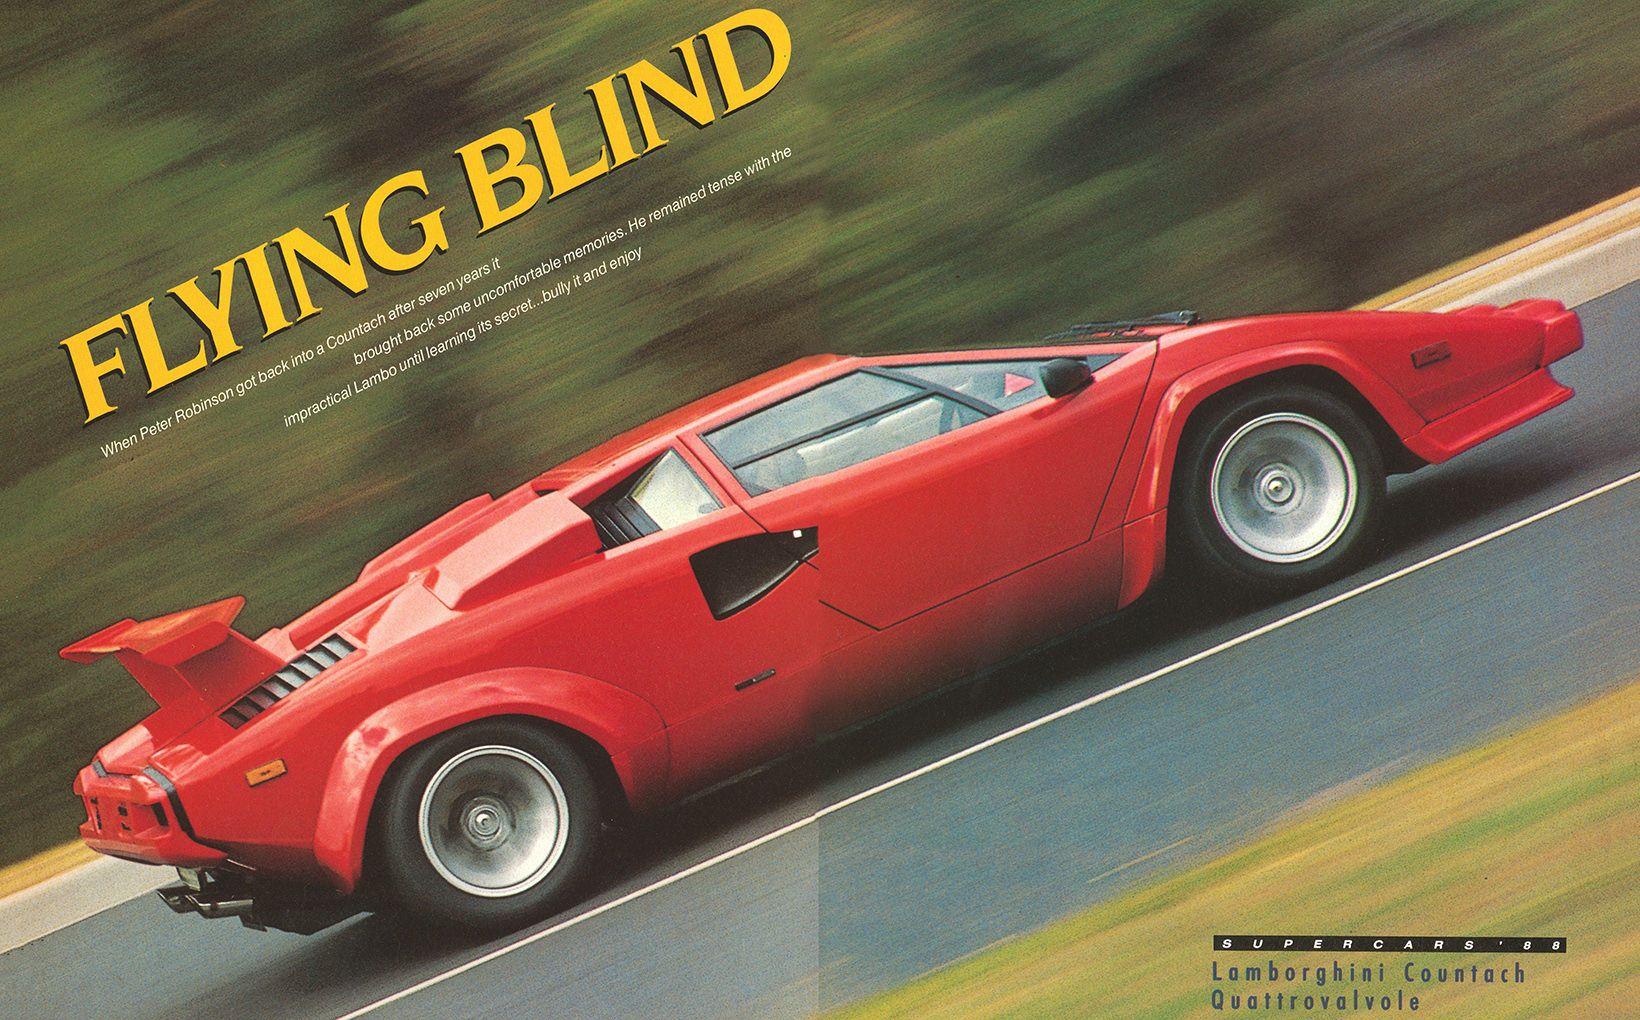 Lamborghini Countach Quattrovalvole Flying Blind Shannons Club